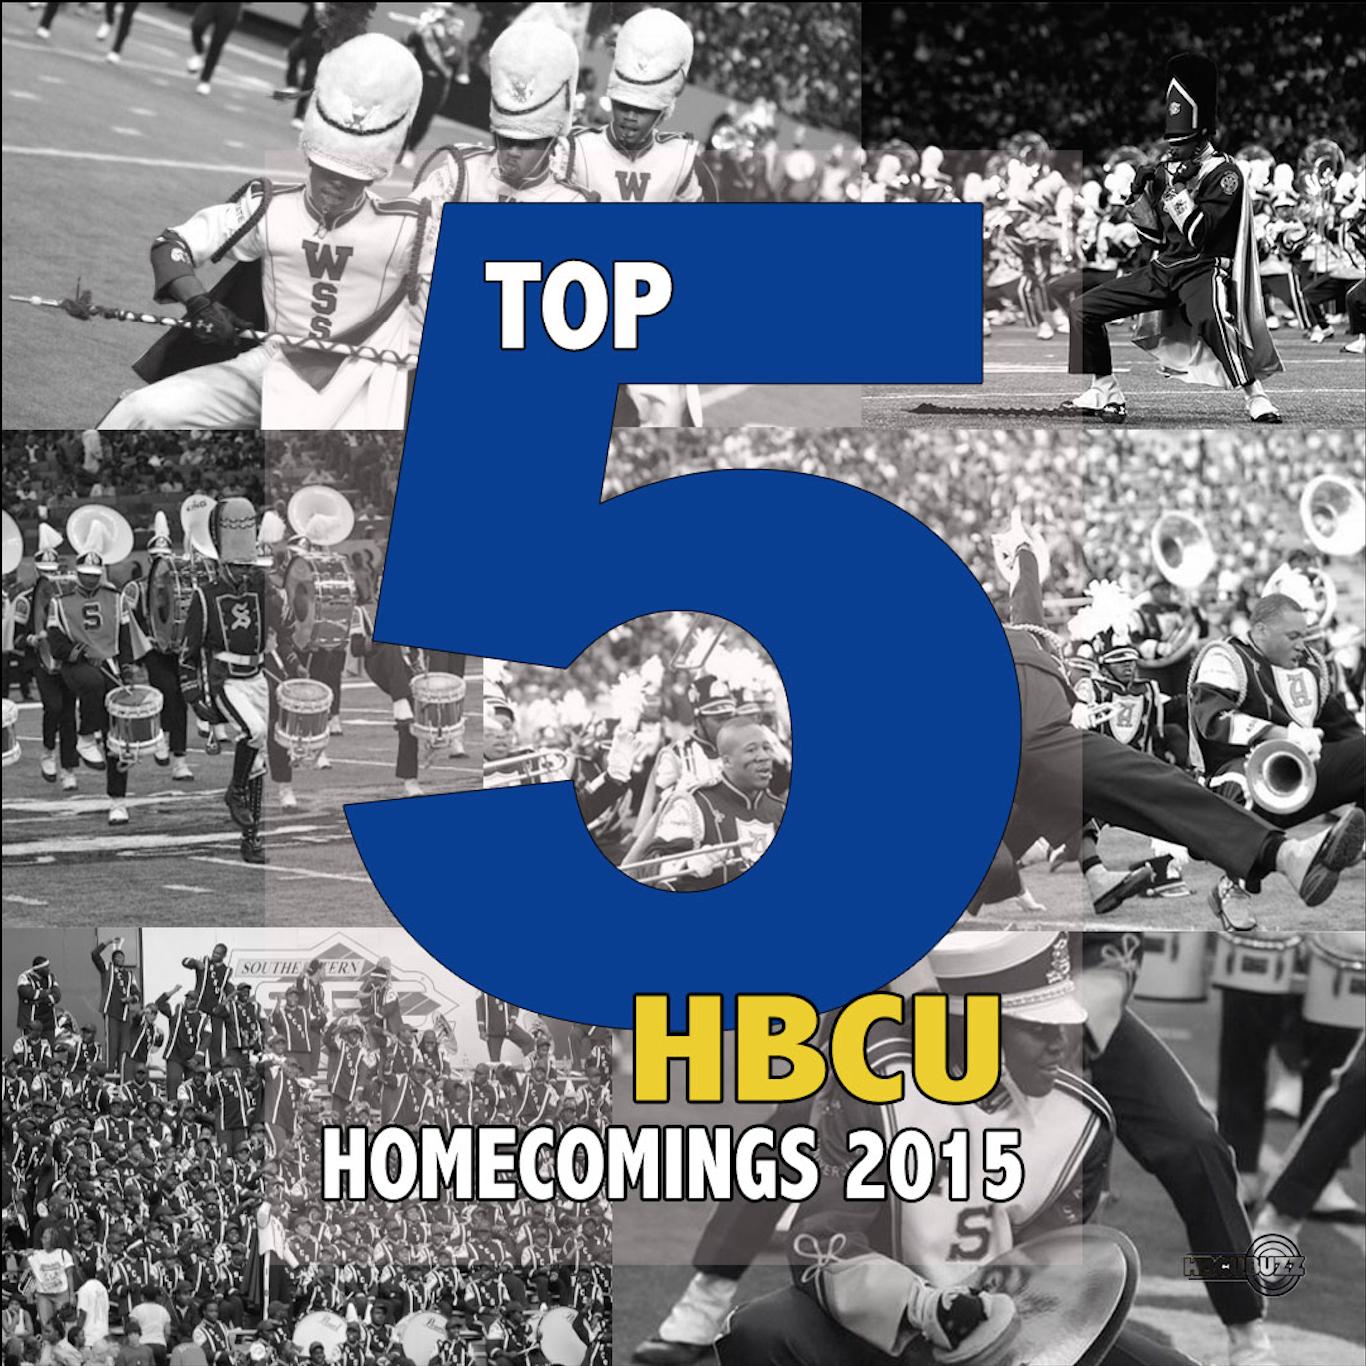 Top 5 HBCU Homecomings 2015